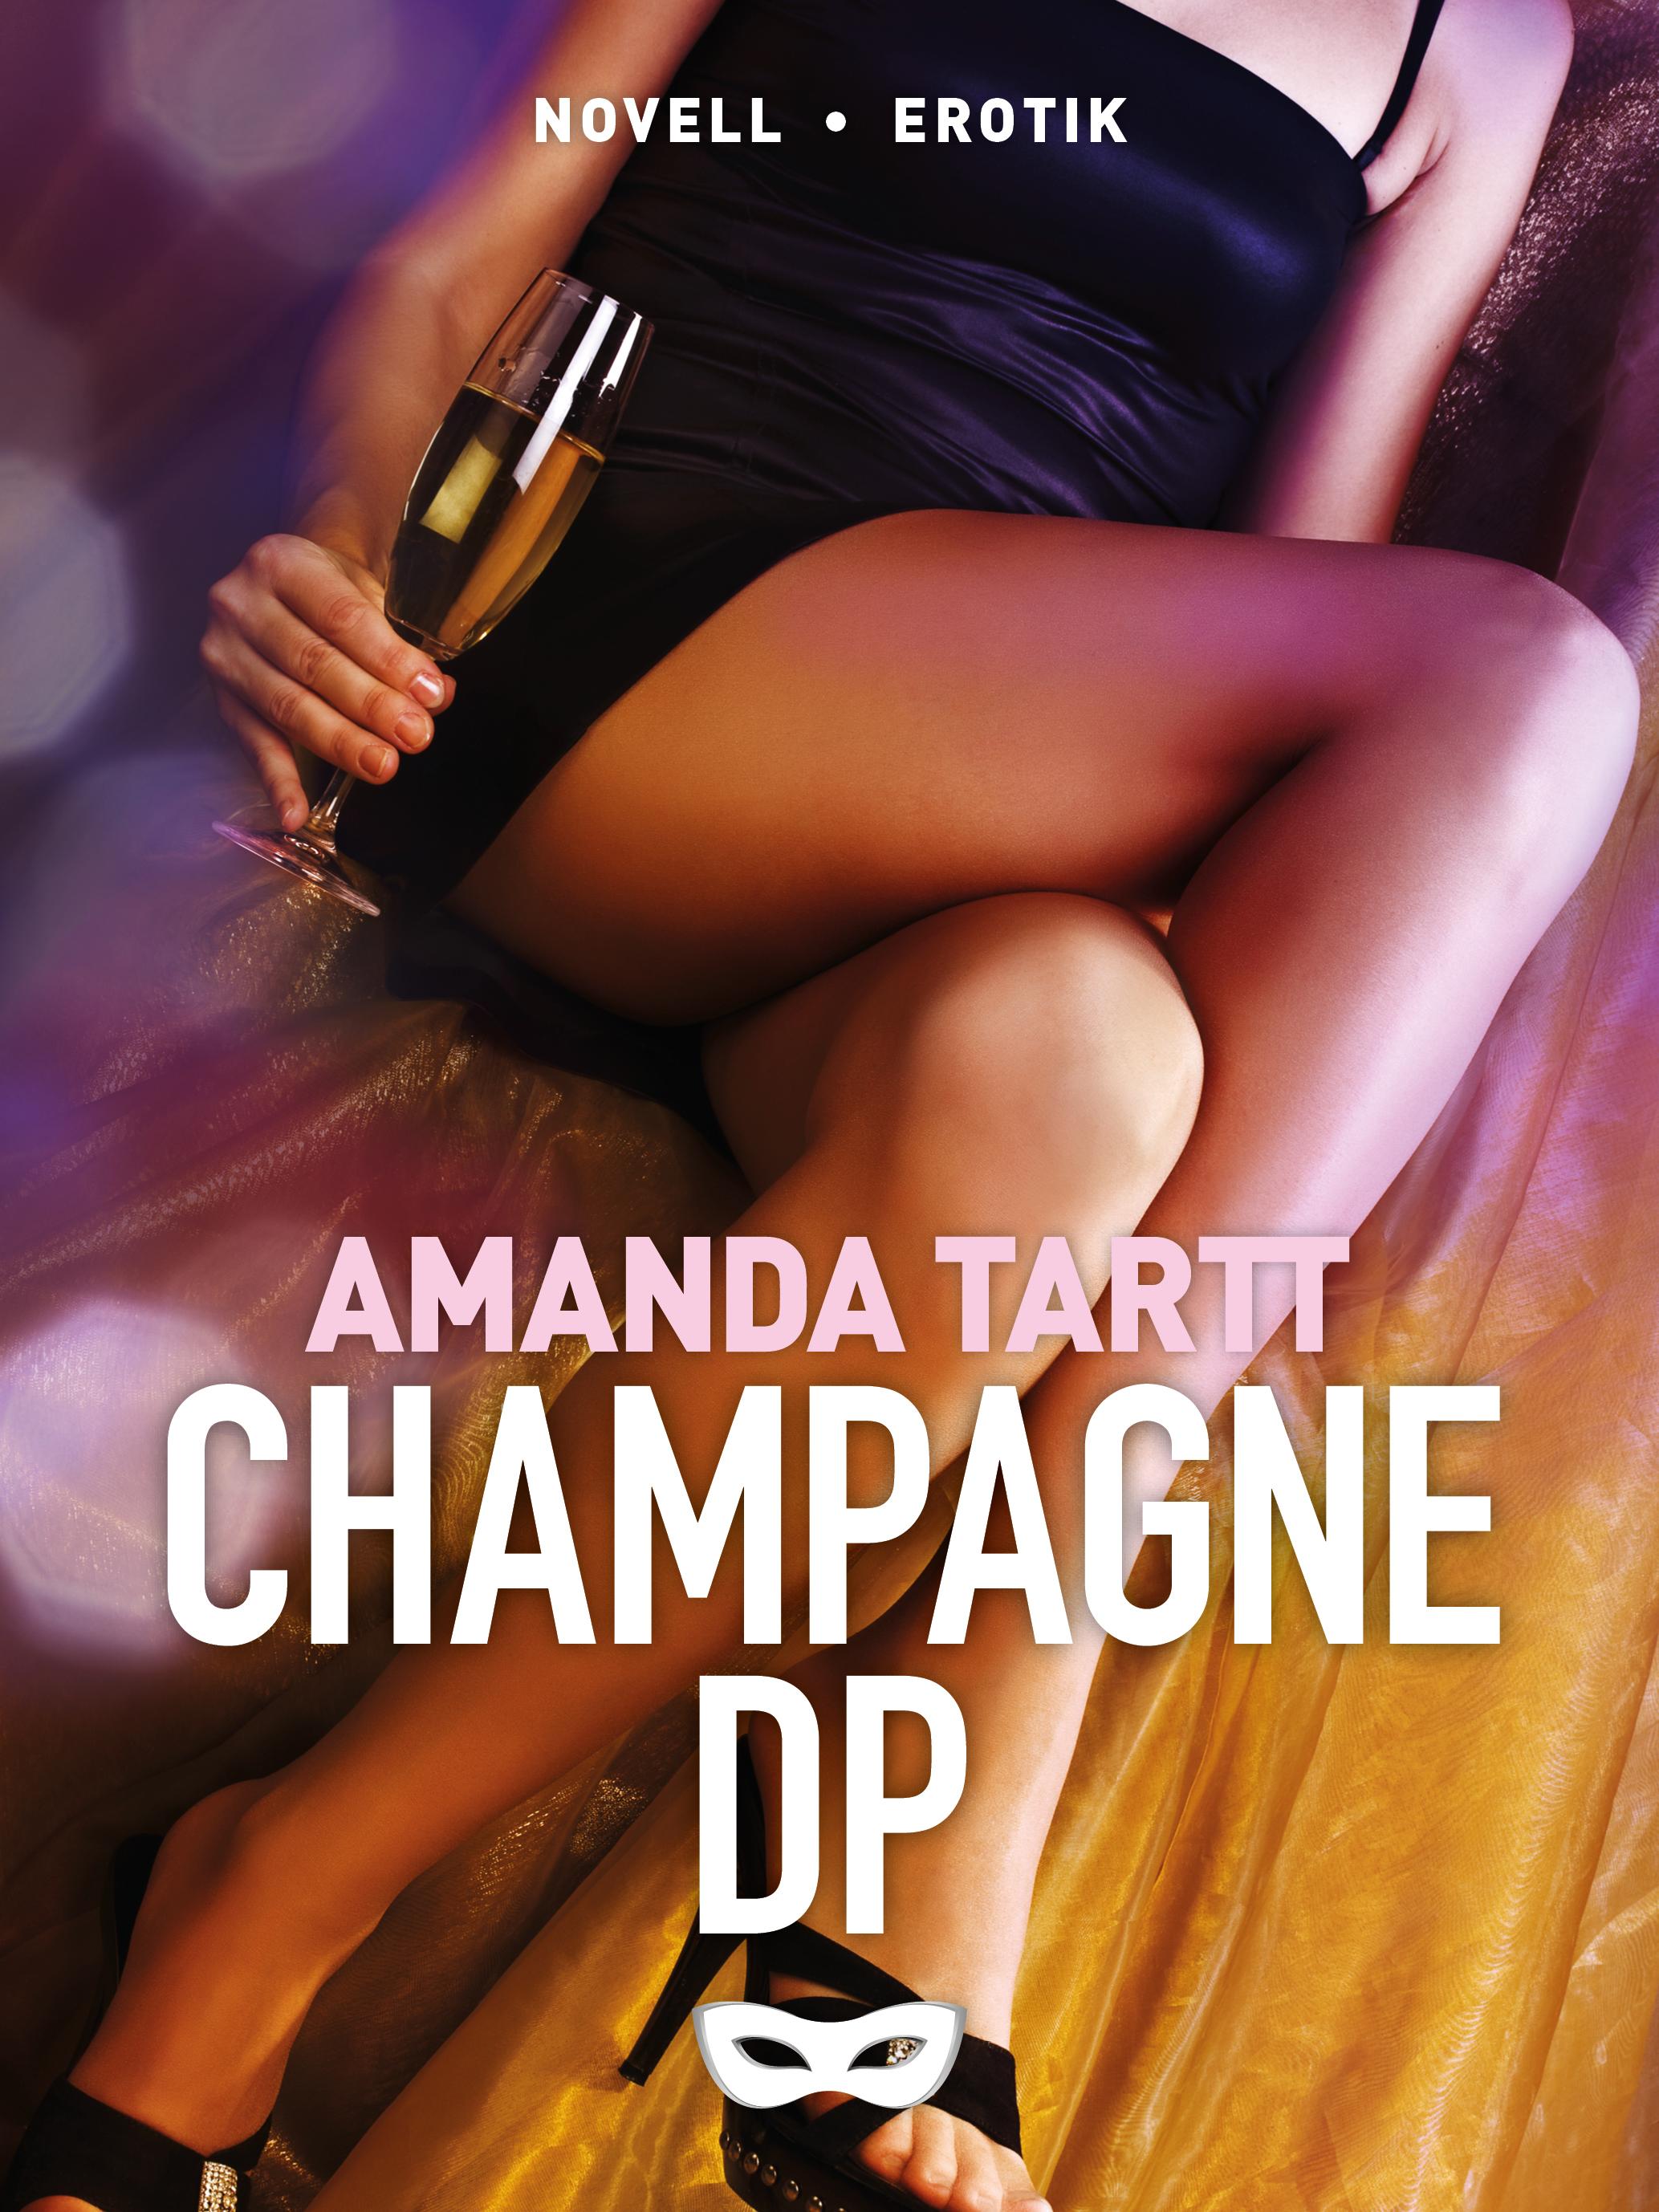 040_cover_ChampagneDP_SV_L.jpg